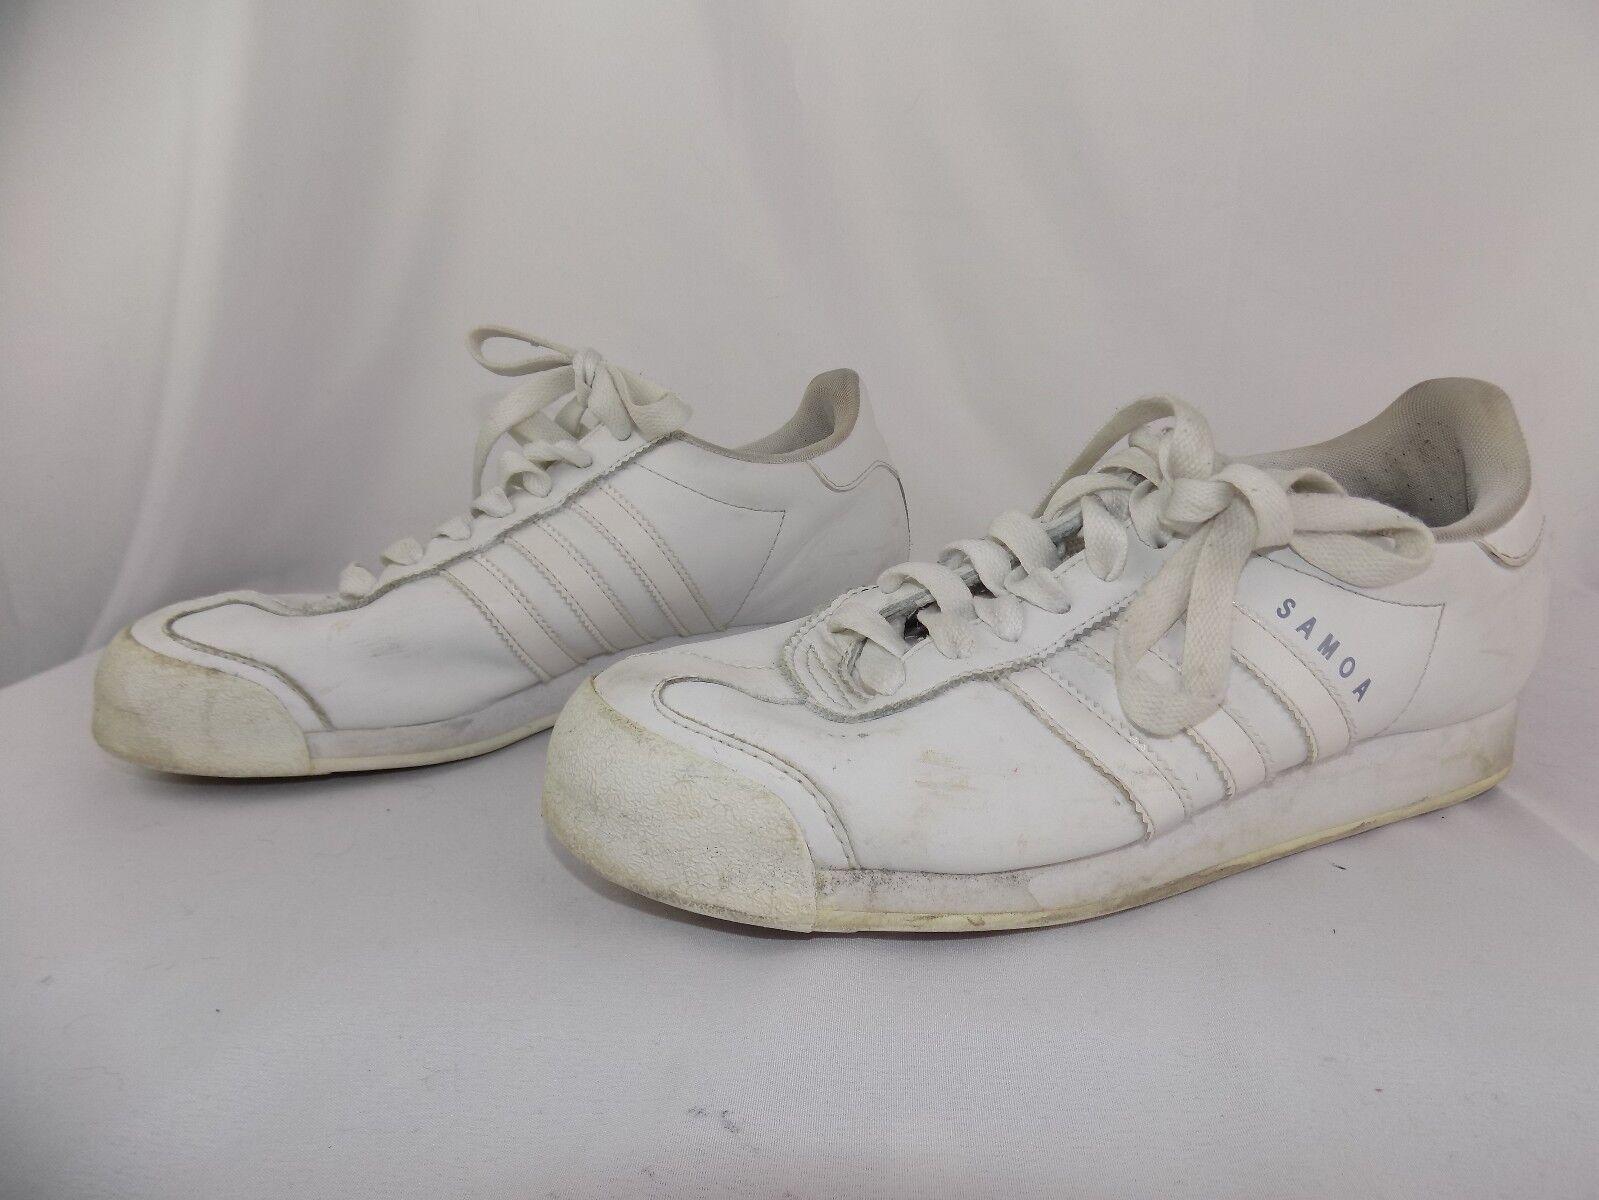 Adidas White Samoa Leather Sneakers shoes Men's Size 9